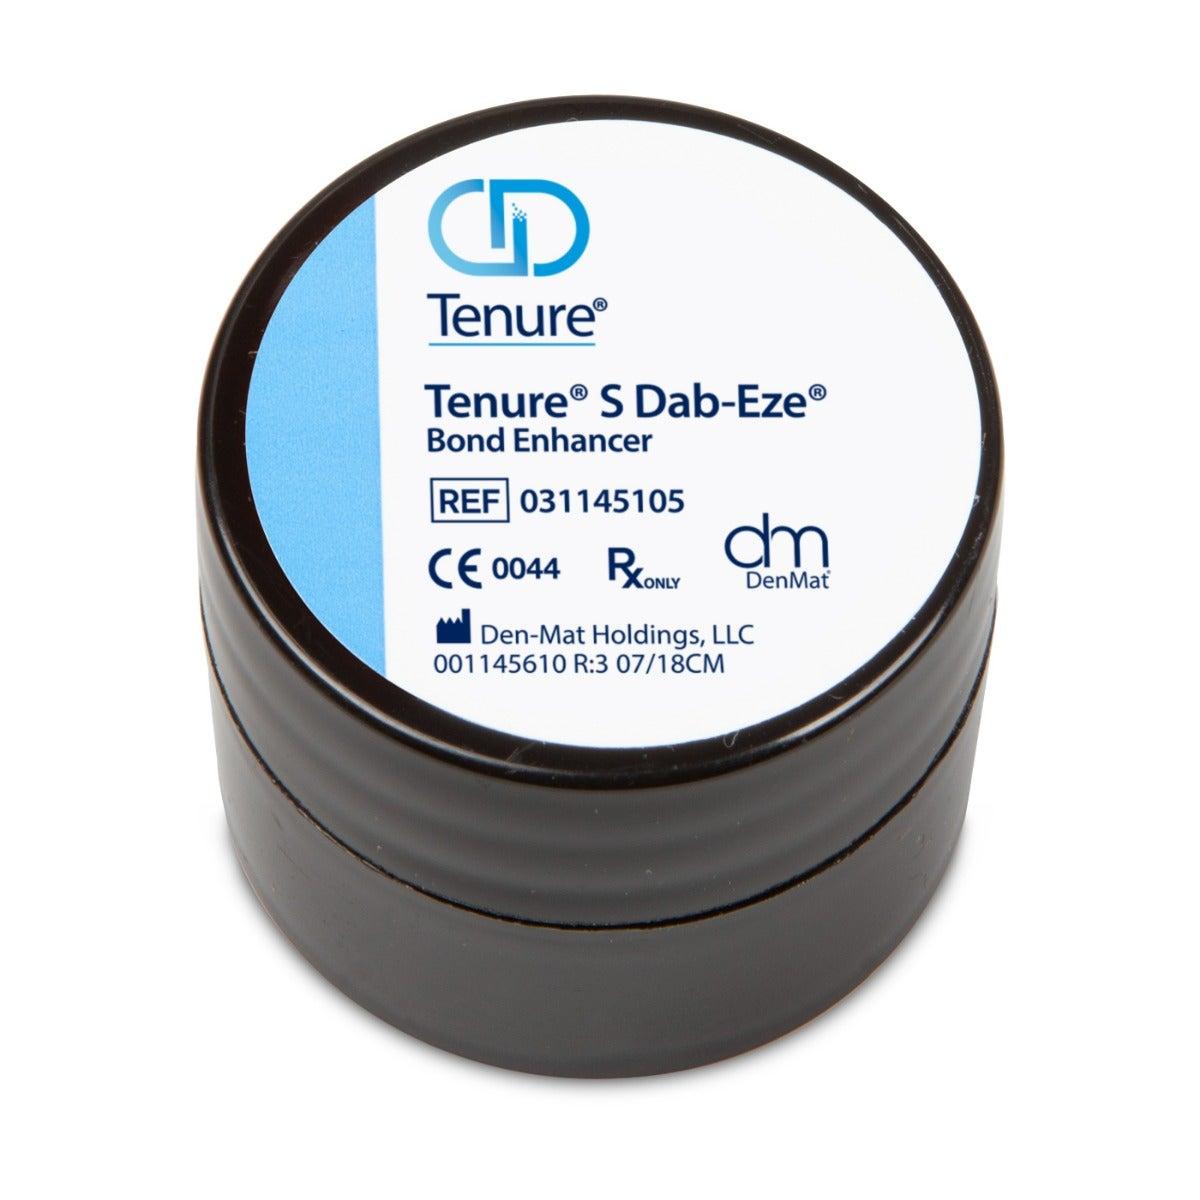 Dental Adhesive - Tenure S Dab-Eze